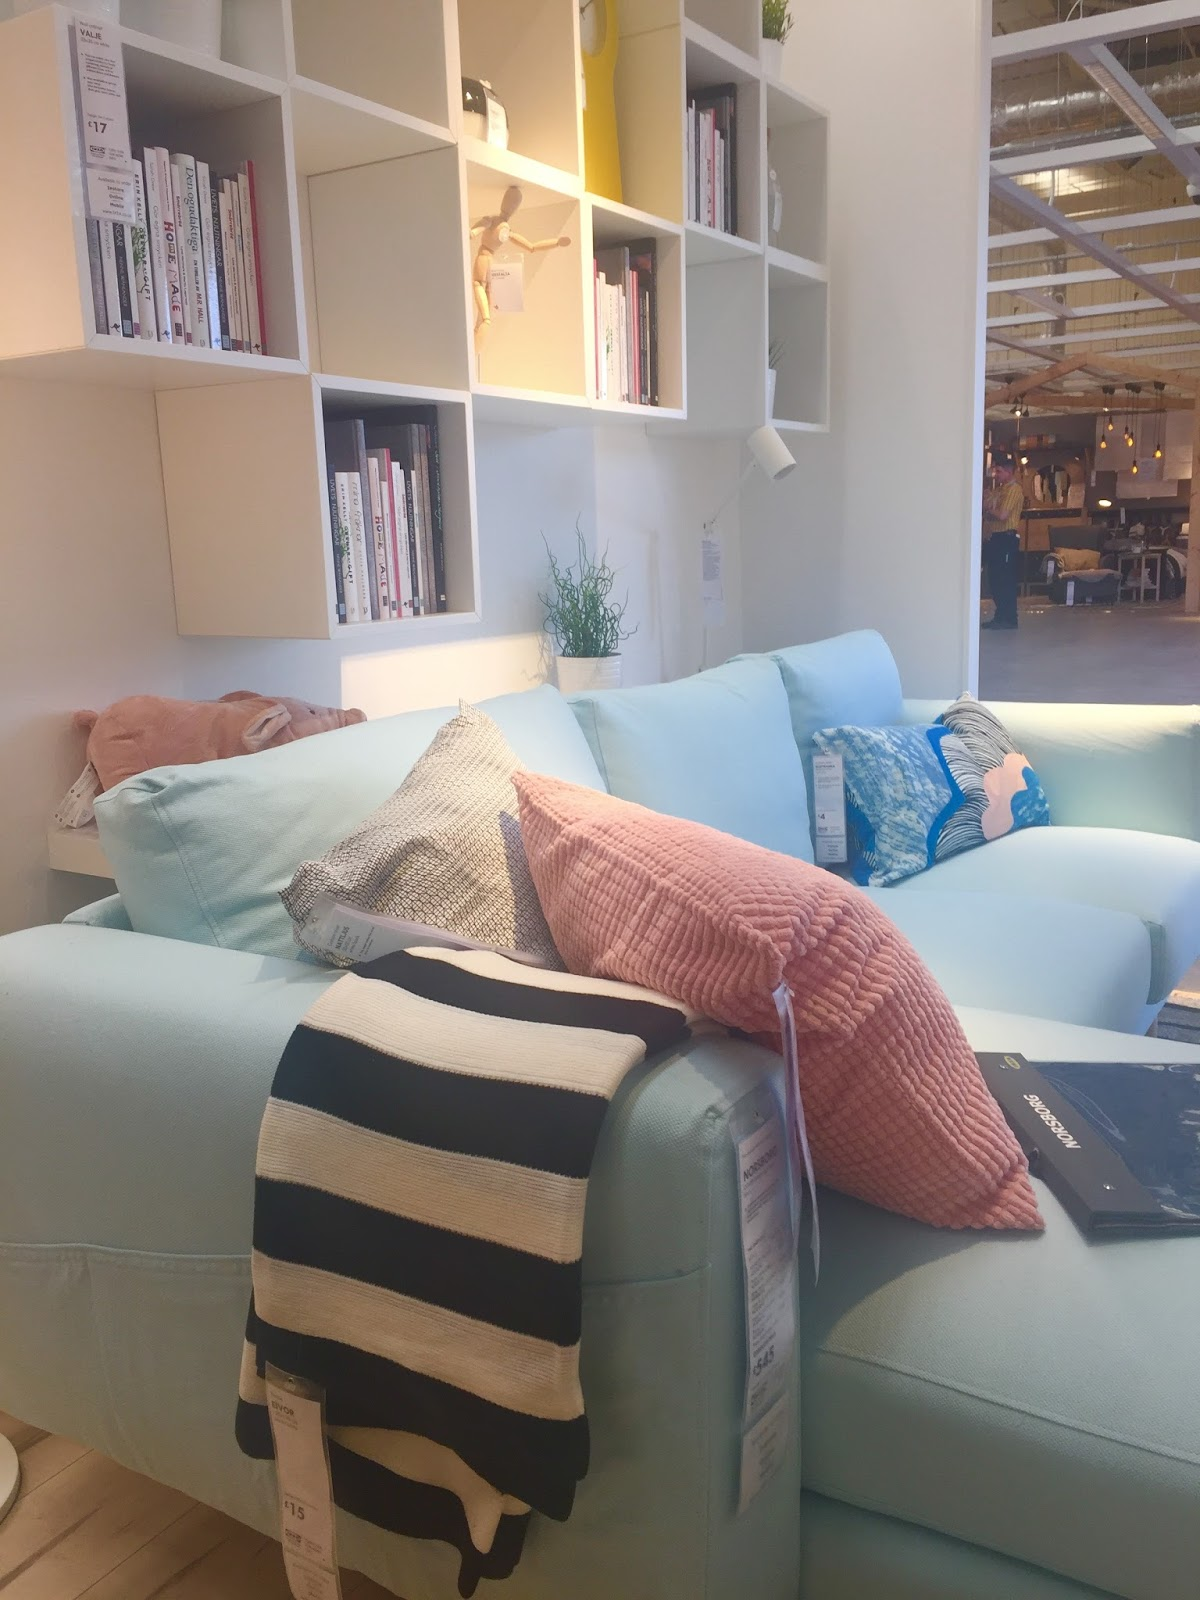 IKEA Aberdeen An Early Preview imemmajack